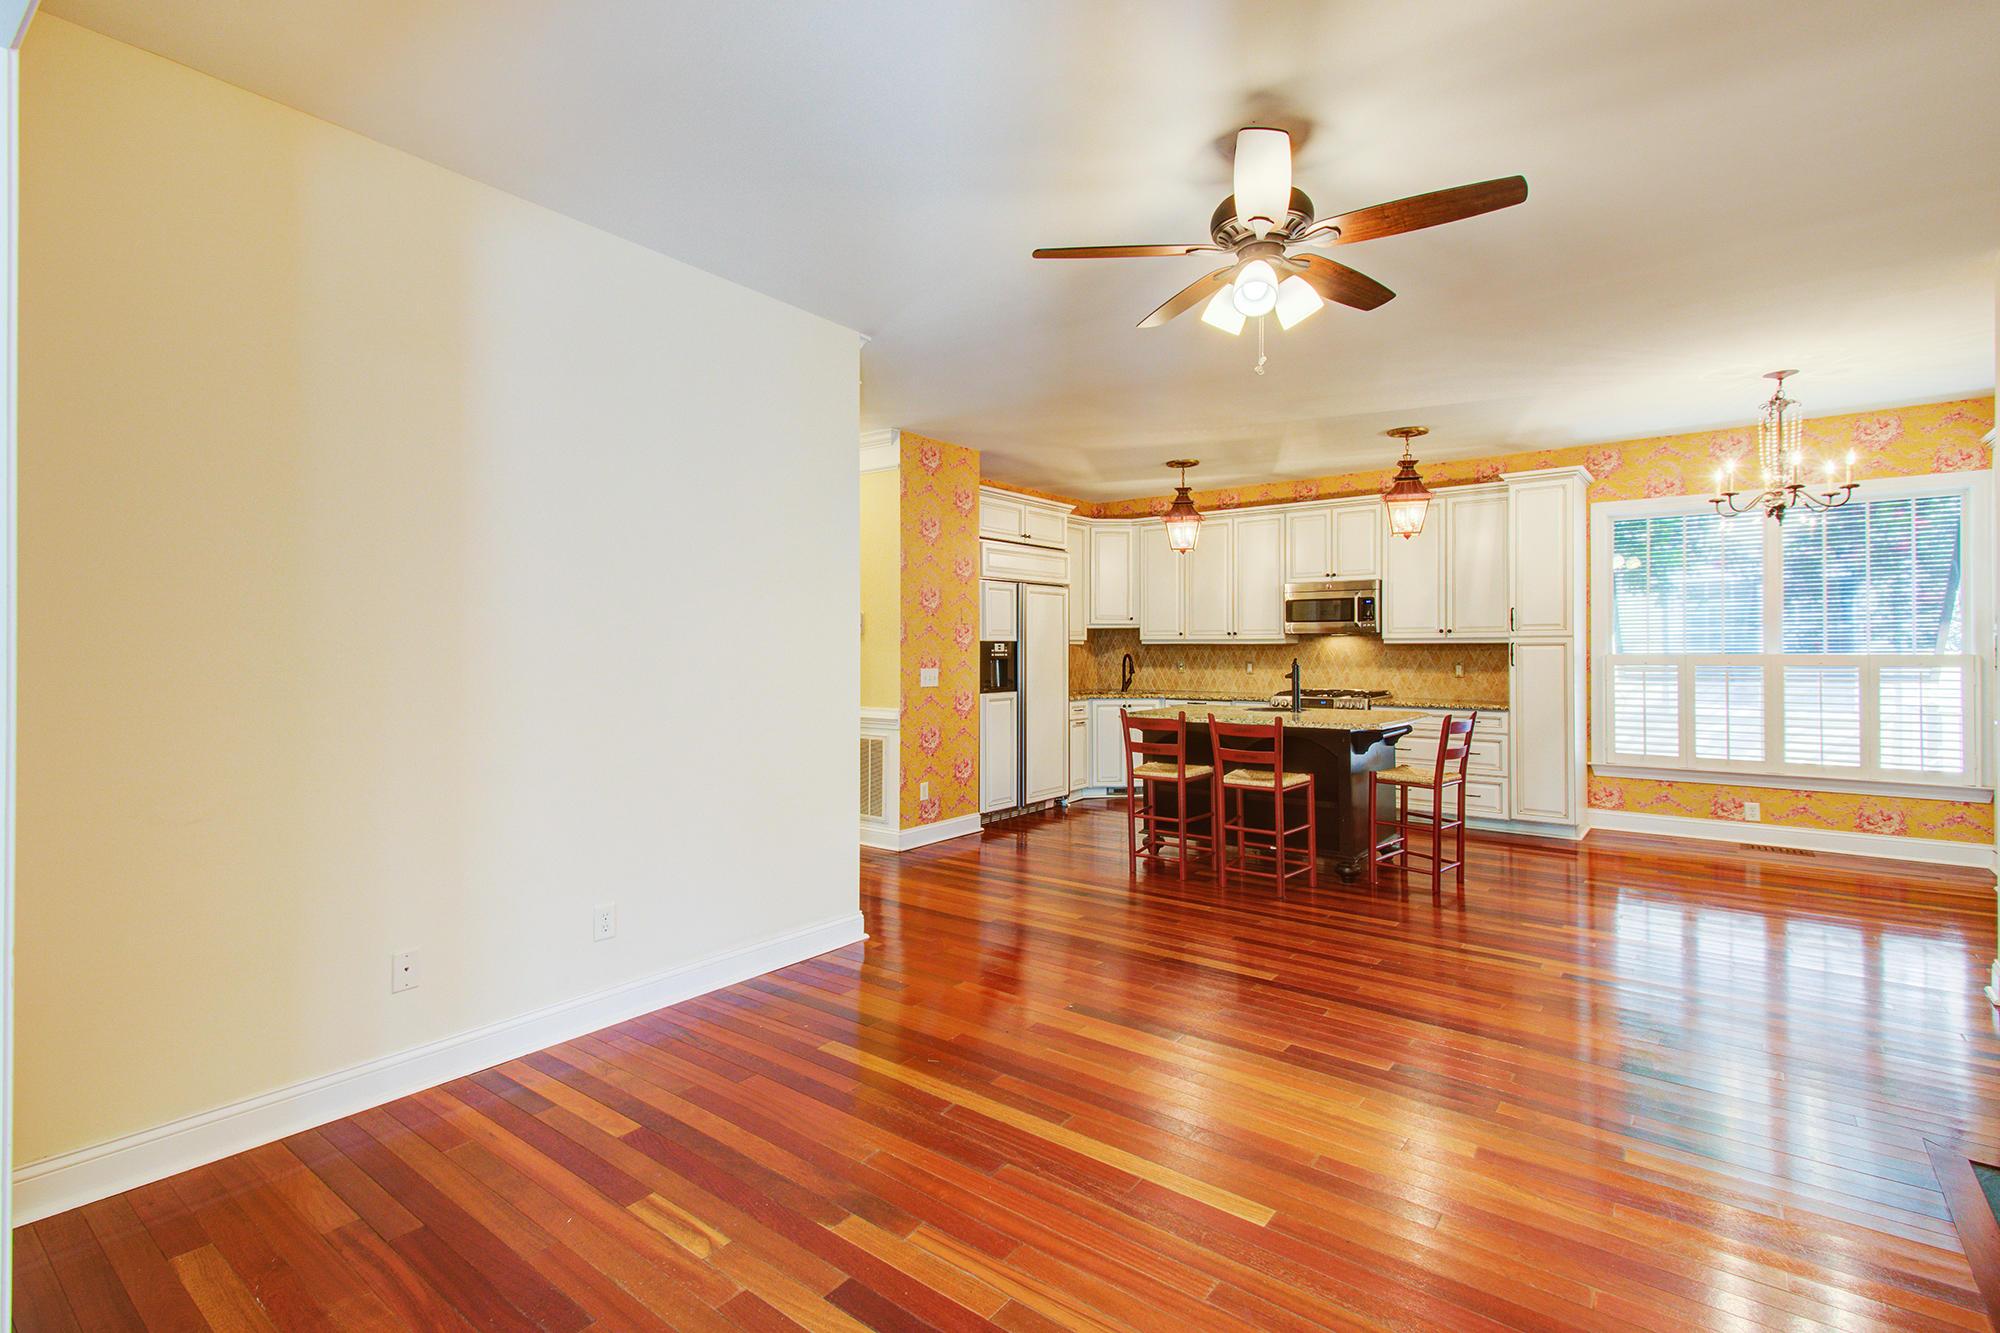 Center Park Homes For Sale - 950 Crossing, Daniel Island, SC - 53